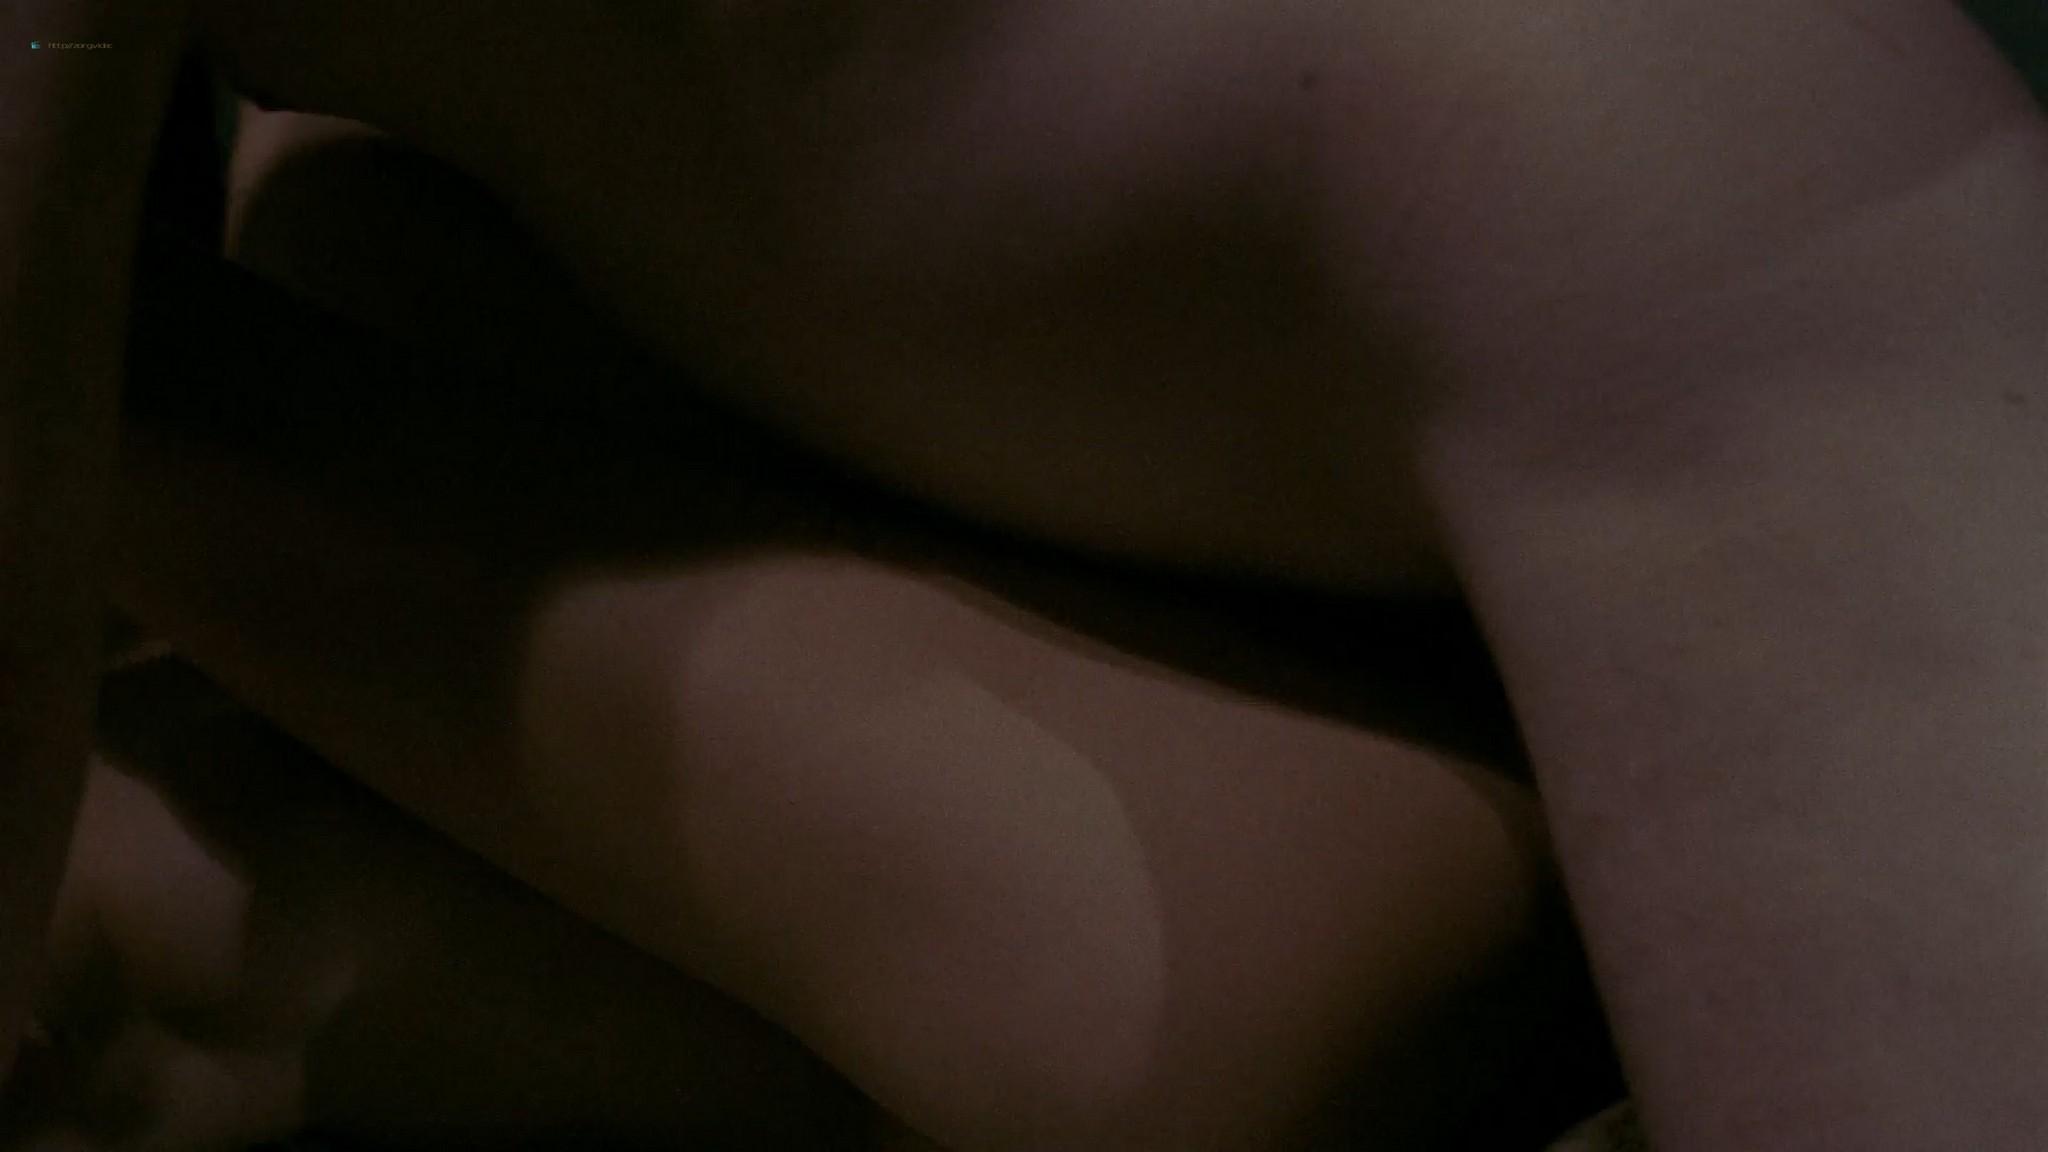 Ekaterina Yuspina nude explicit sex Tatyana Polozhiy, Radmila Shegoleva nude sex too - DAU Katya Tanya (2020) HD 1080p (13)